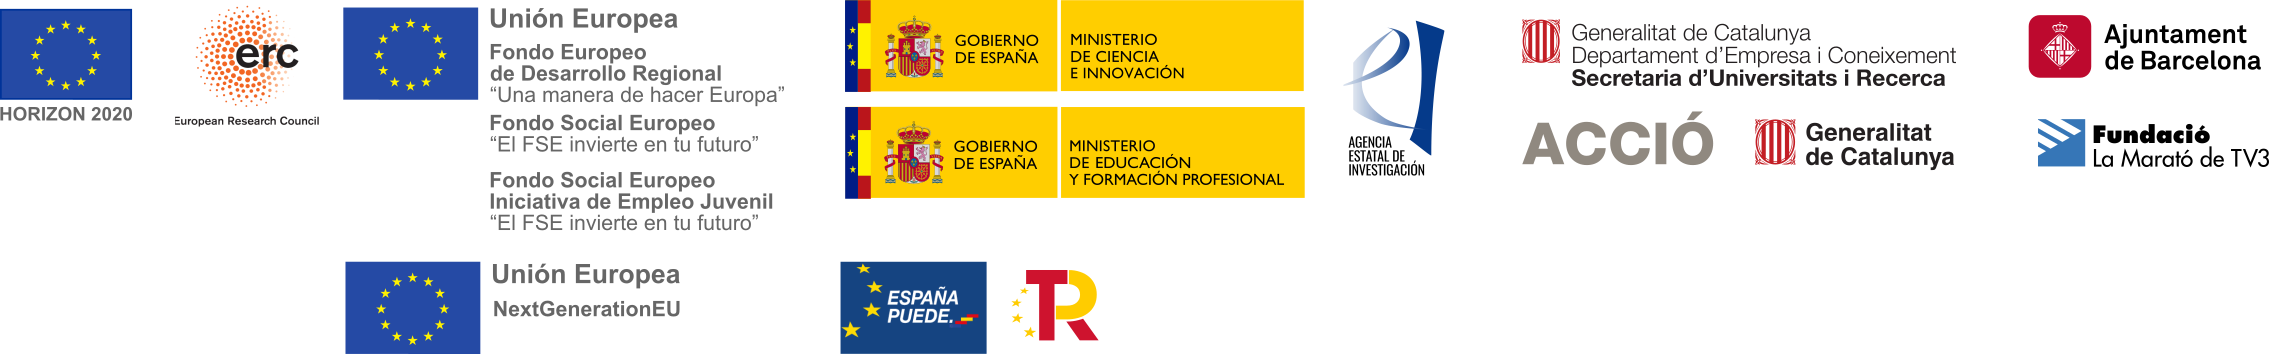 Logos Funding Institutions